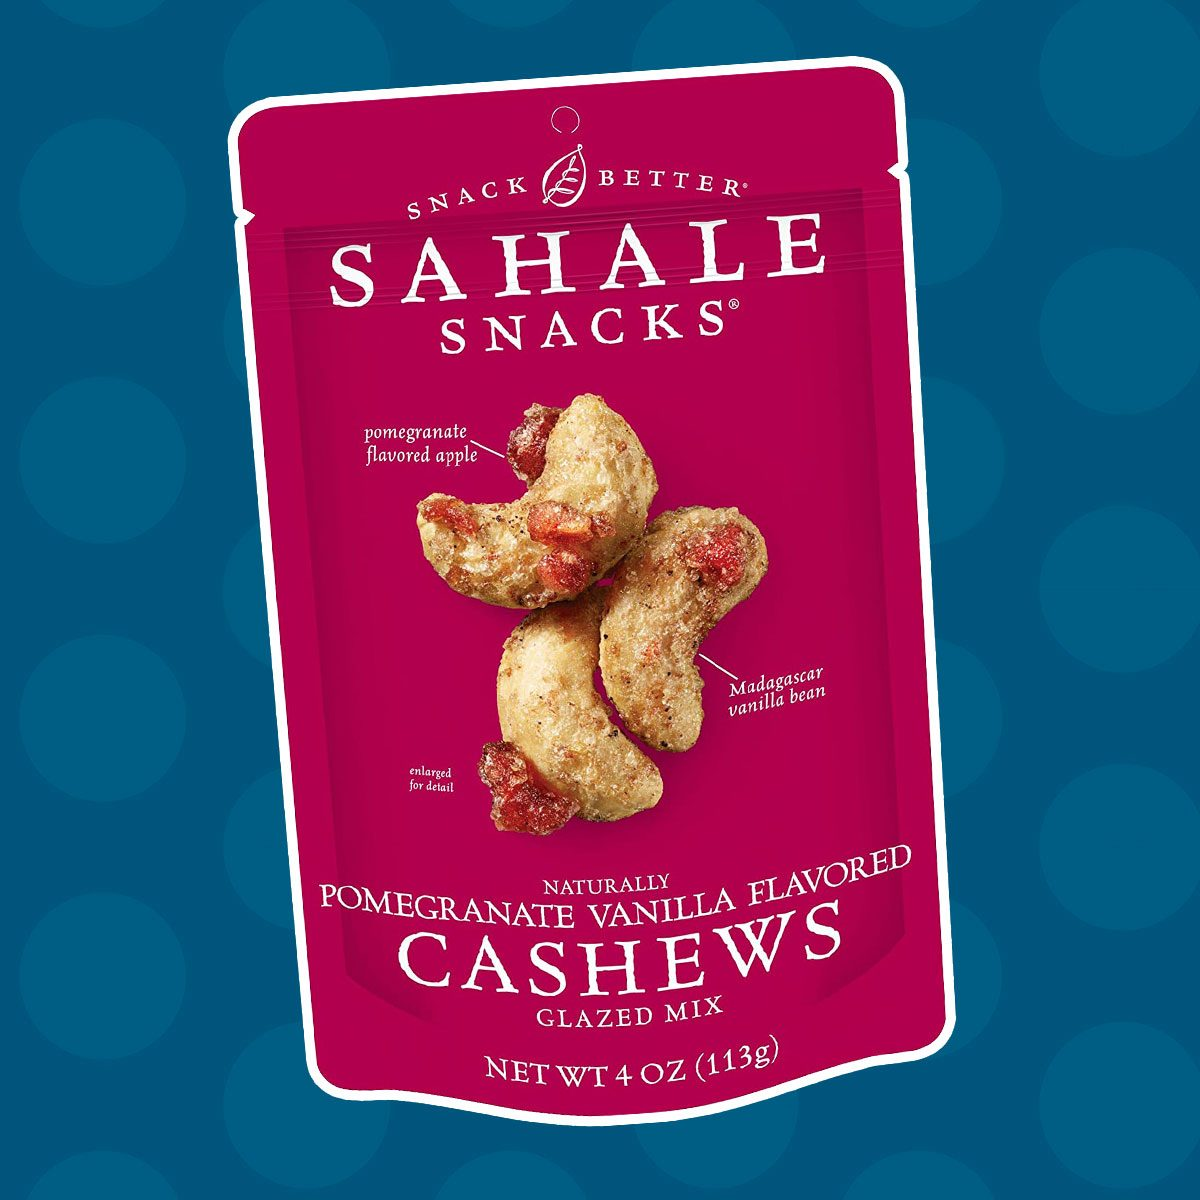 Sahale Snacks Pomegranate Vanilla Cashews